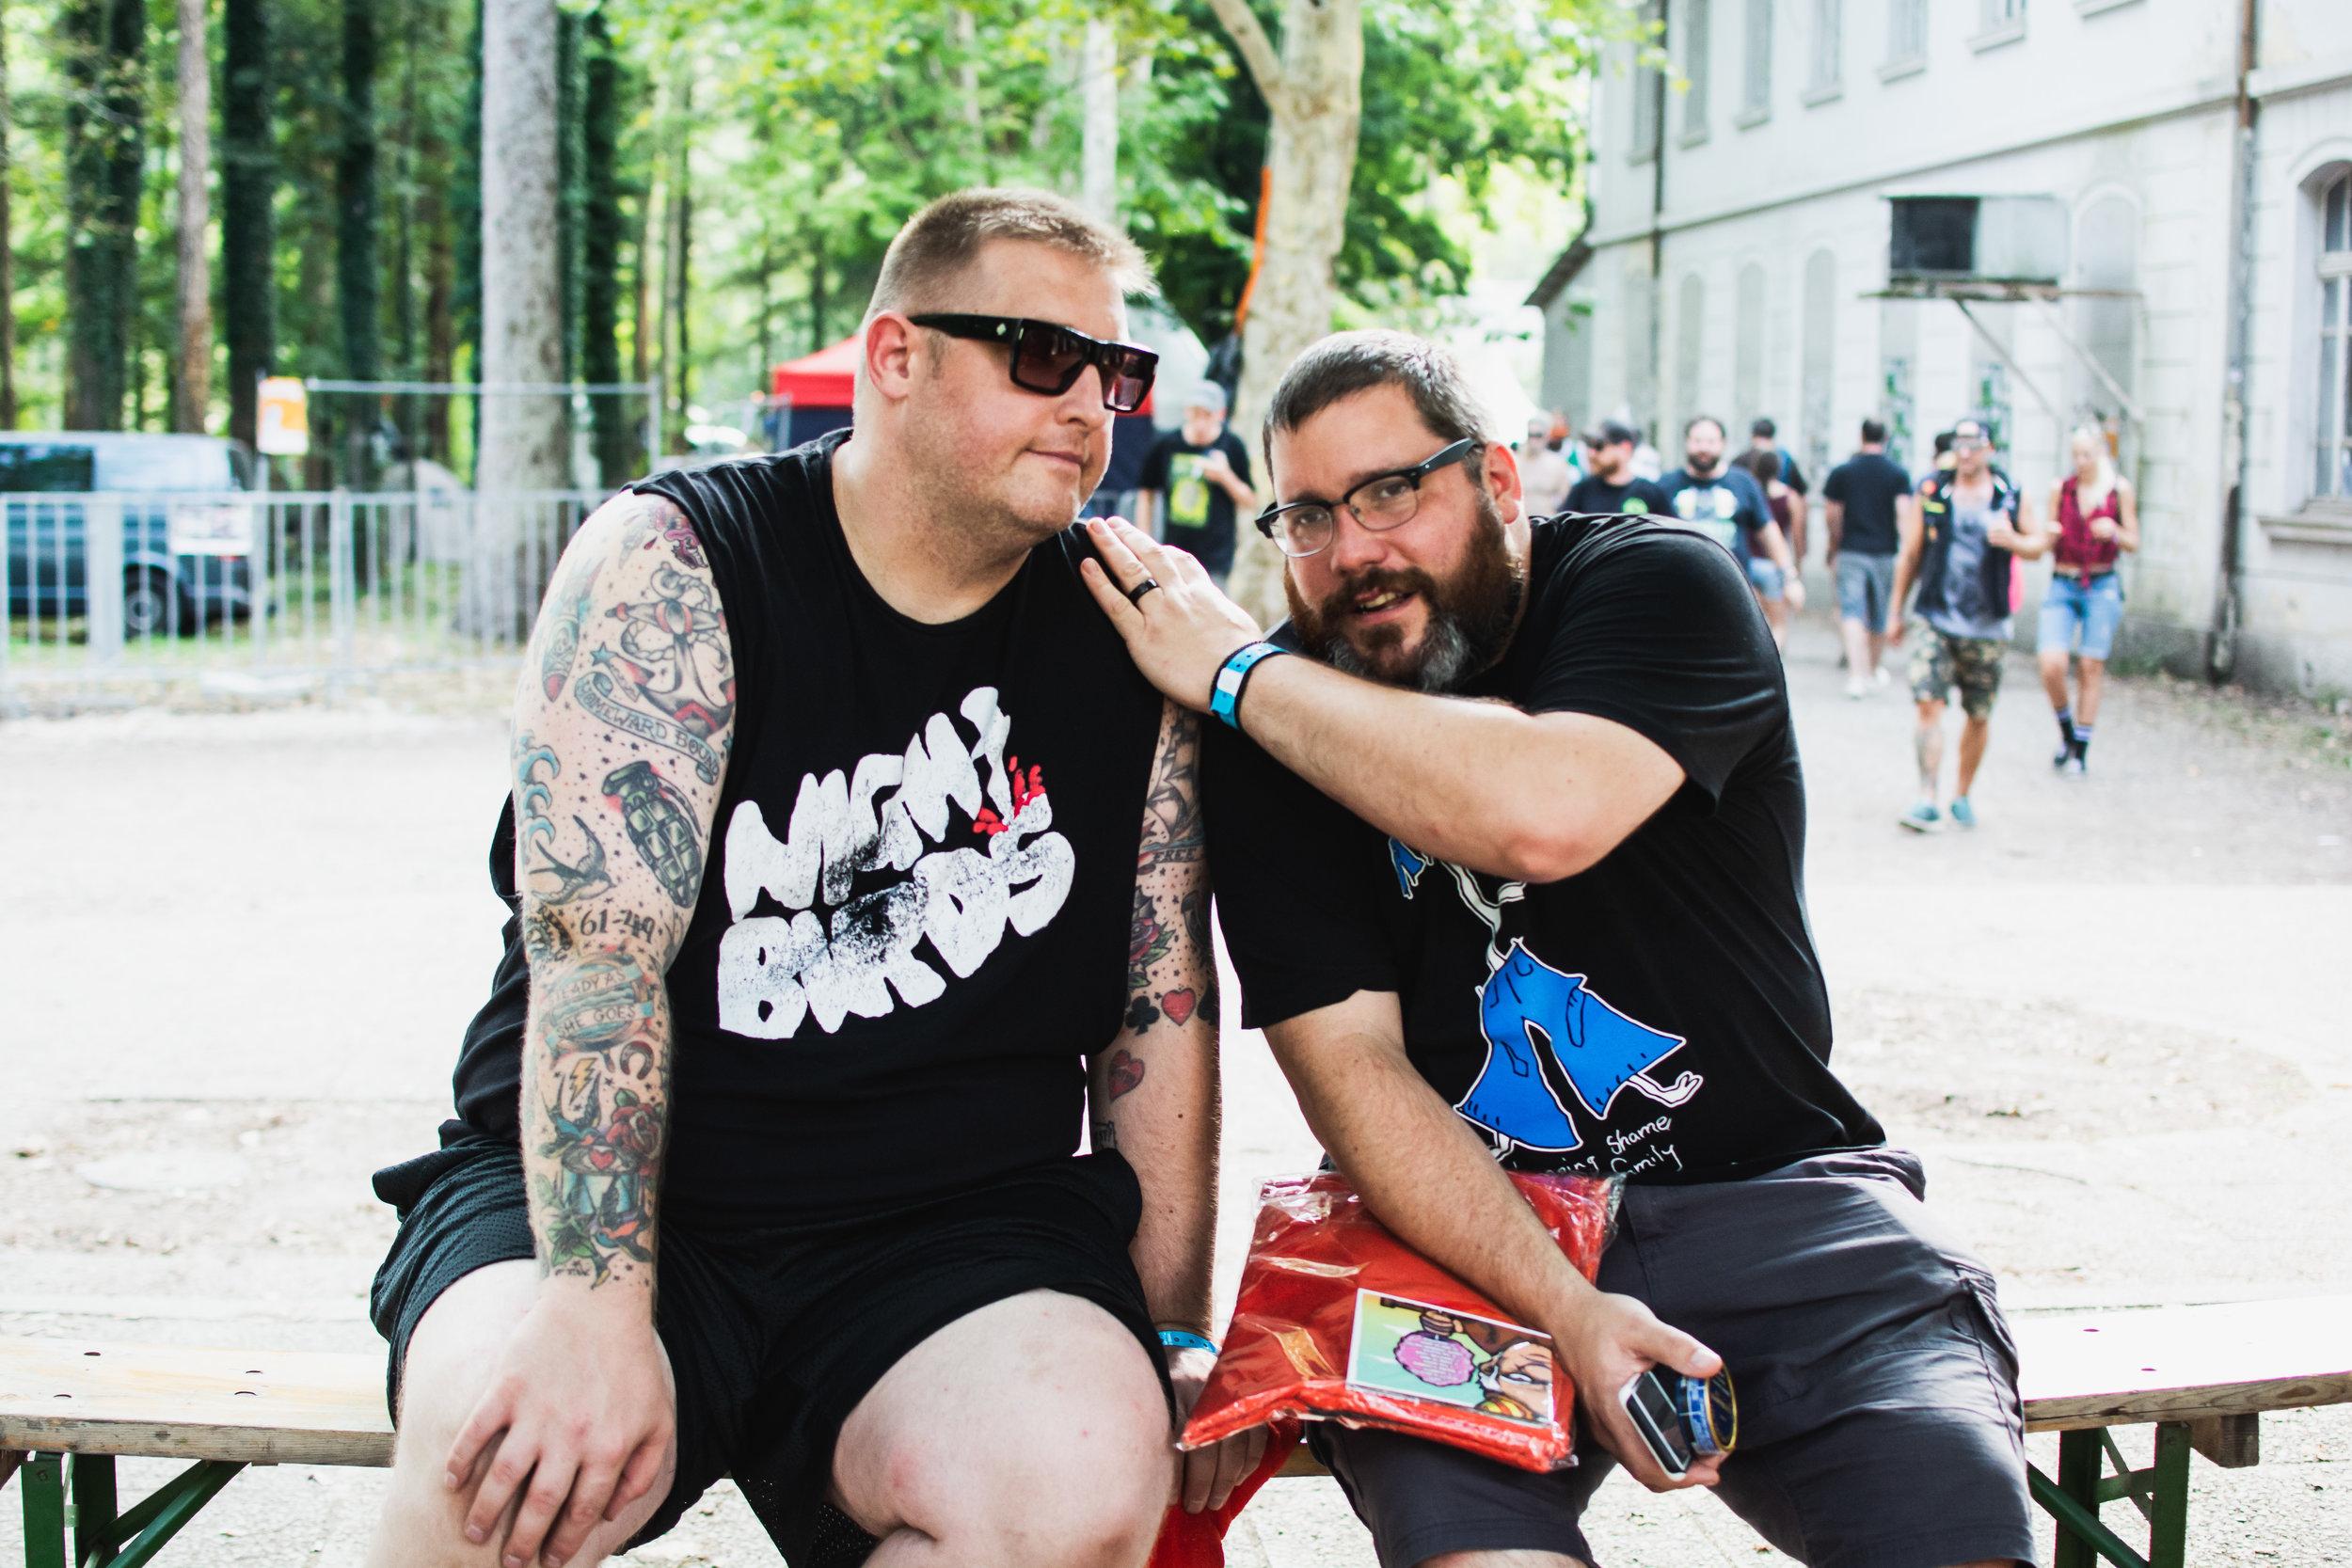 Punk-Rock-Holiday-Thursday_8_2018August 09, 2018.jpg